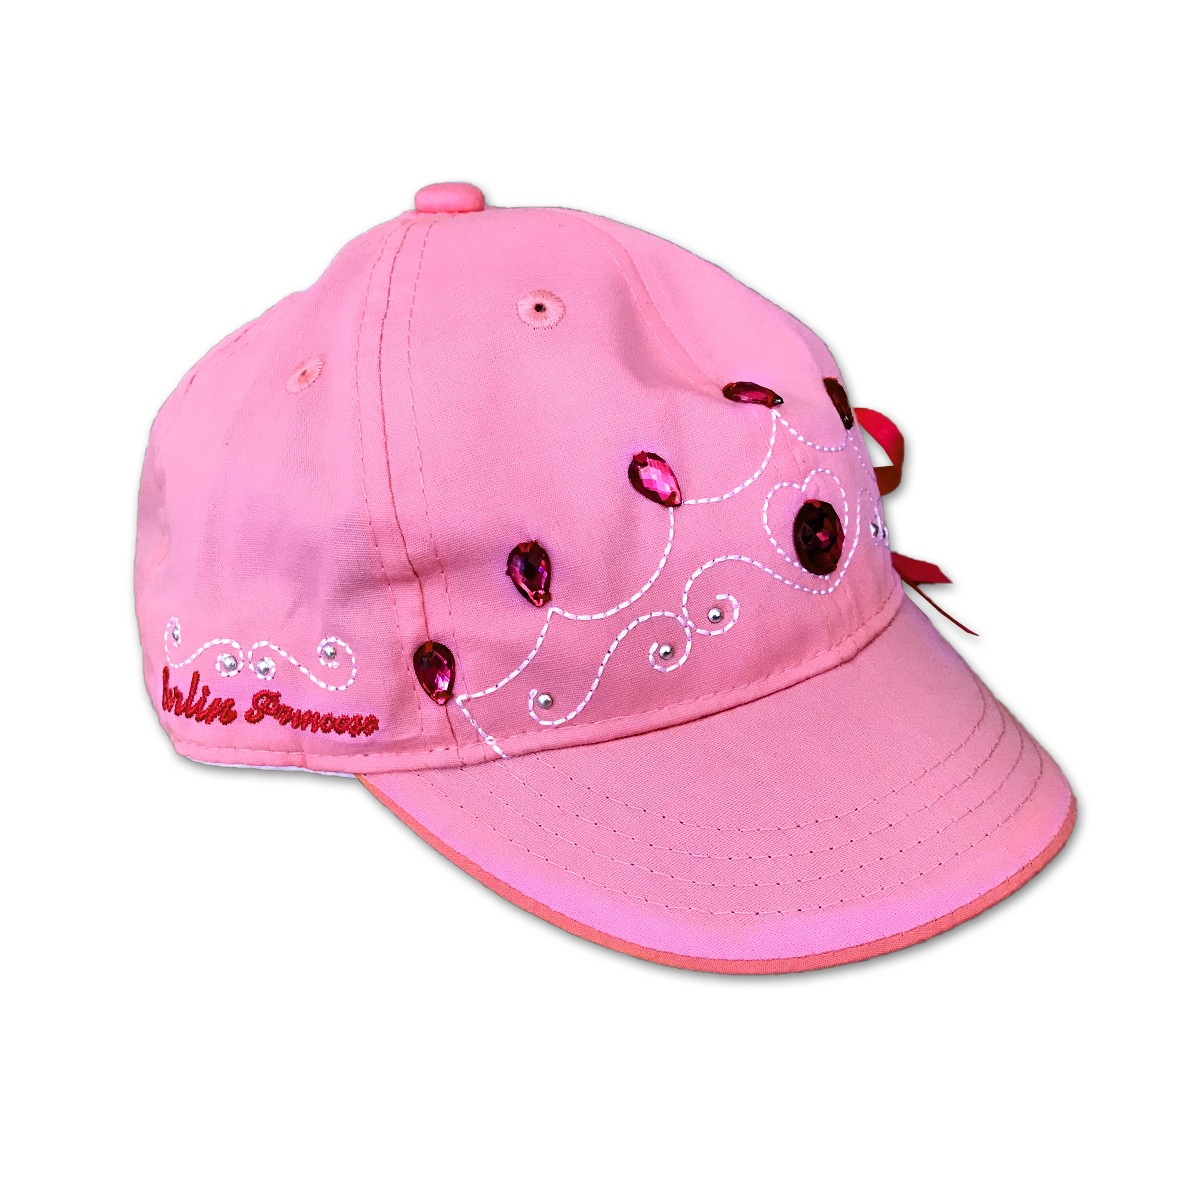 Basecap Kinder Mädchen Berlin rosa